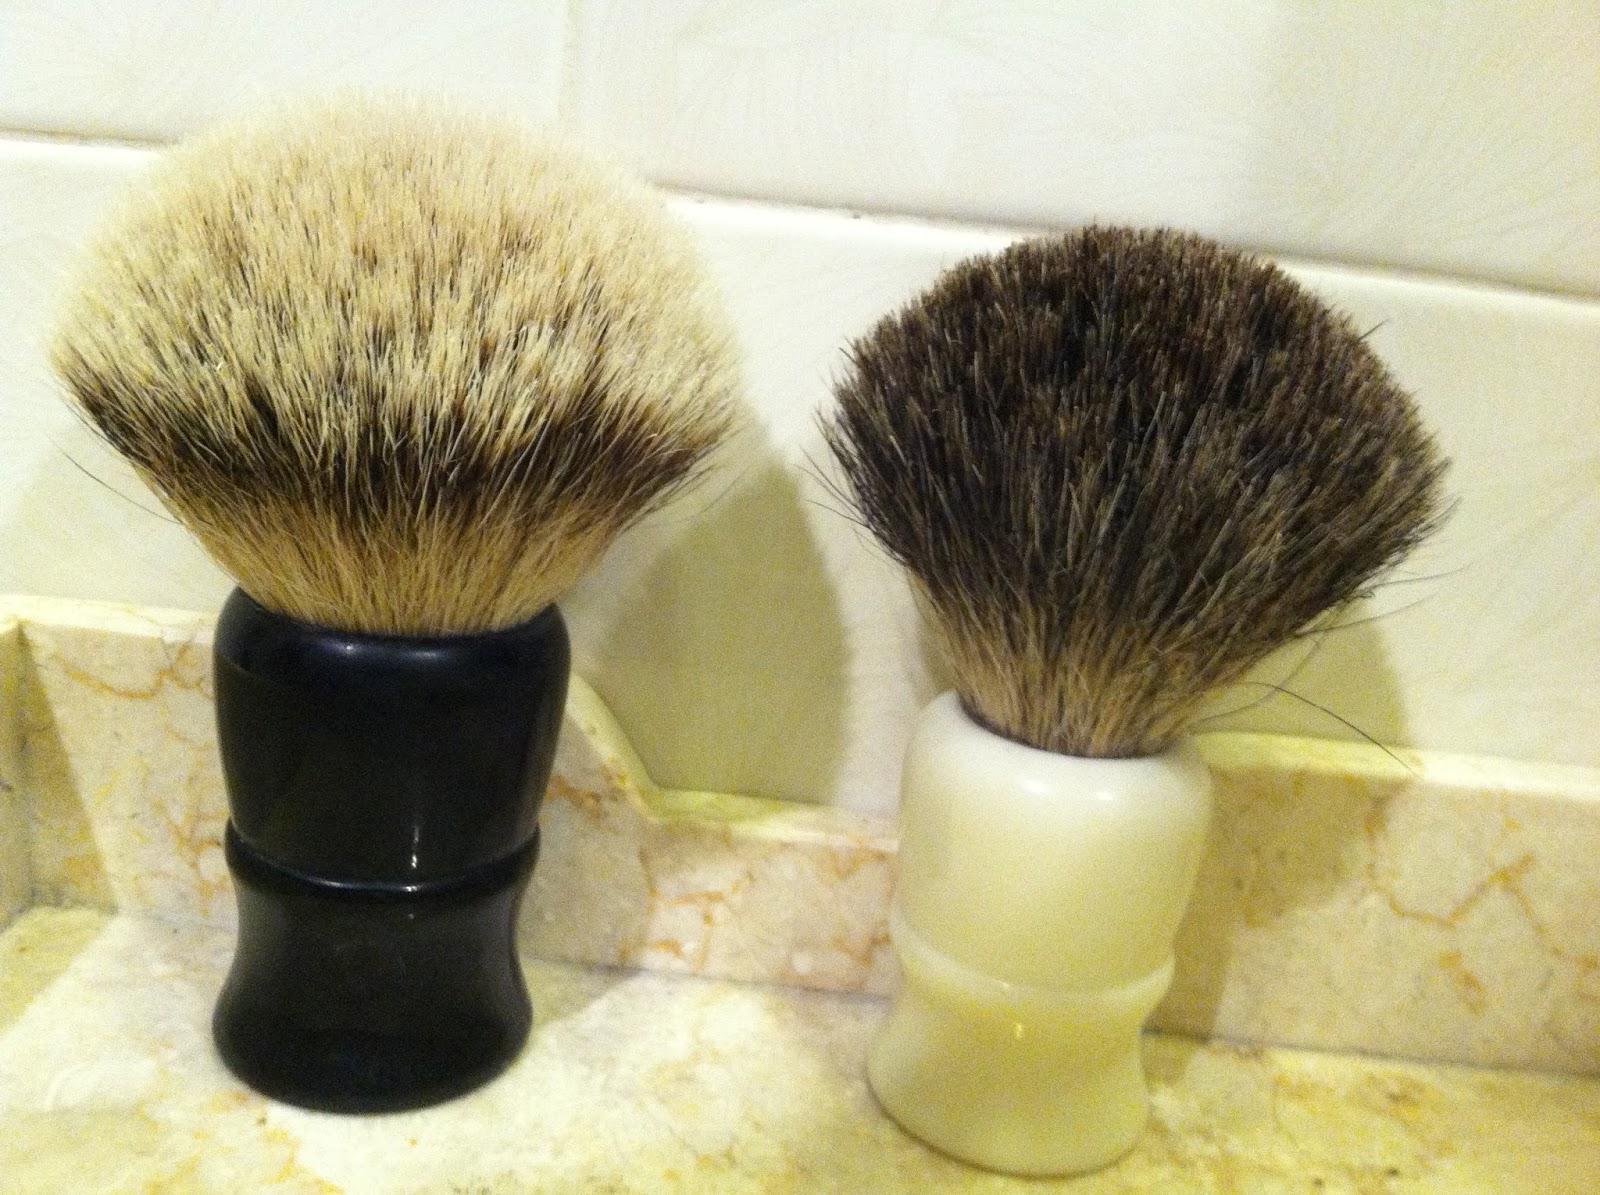 for sale baby shoes never worn whipped dog badger shaving brush